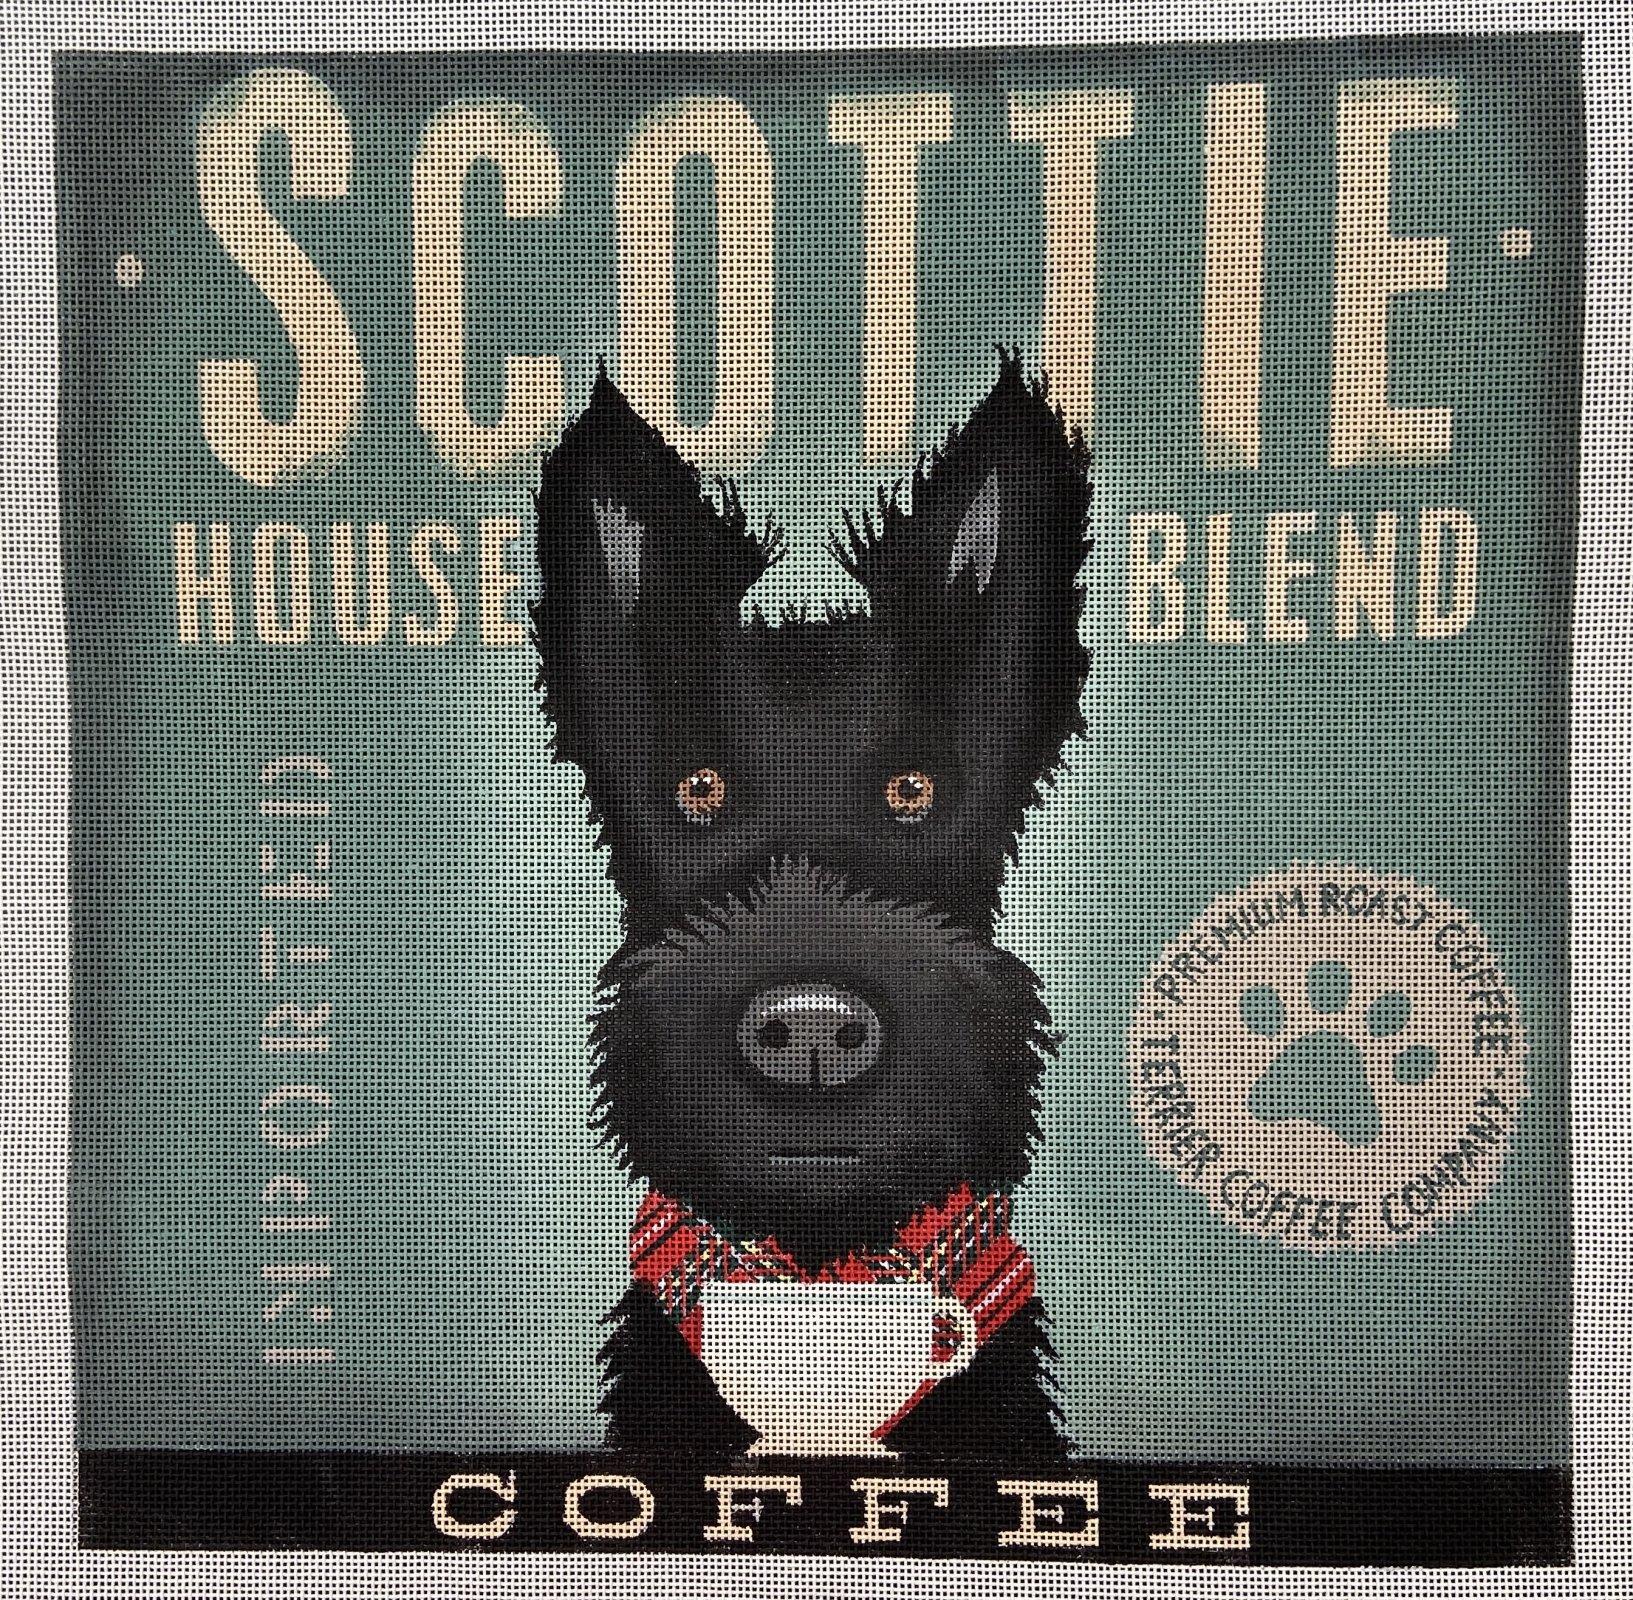 TCSF114 Scottie Coffee Christ Lewis